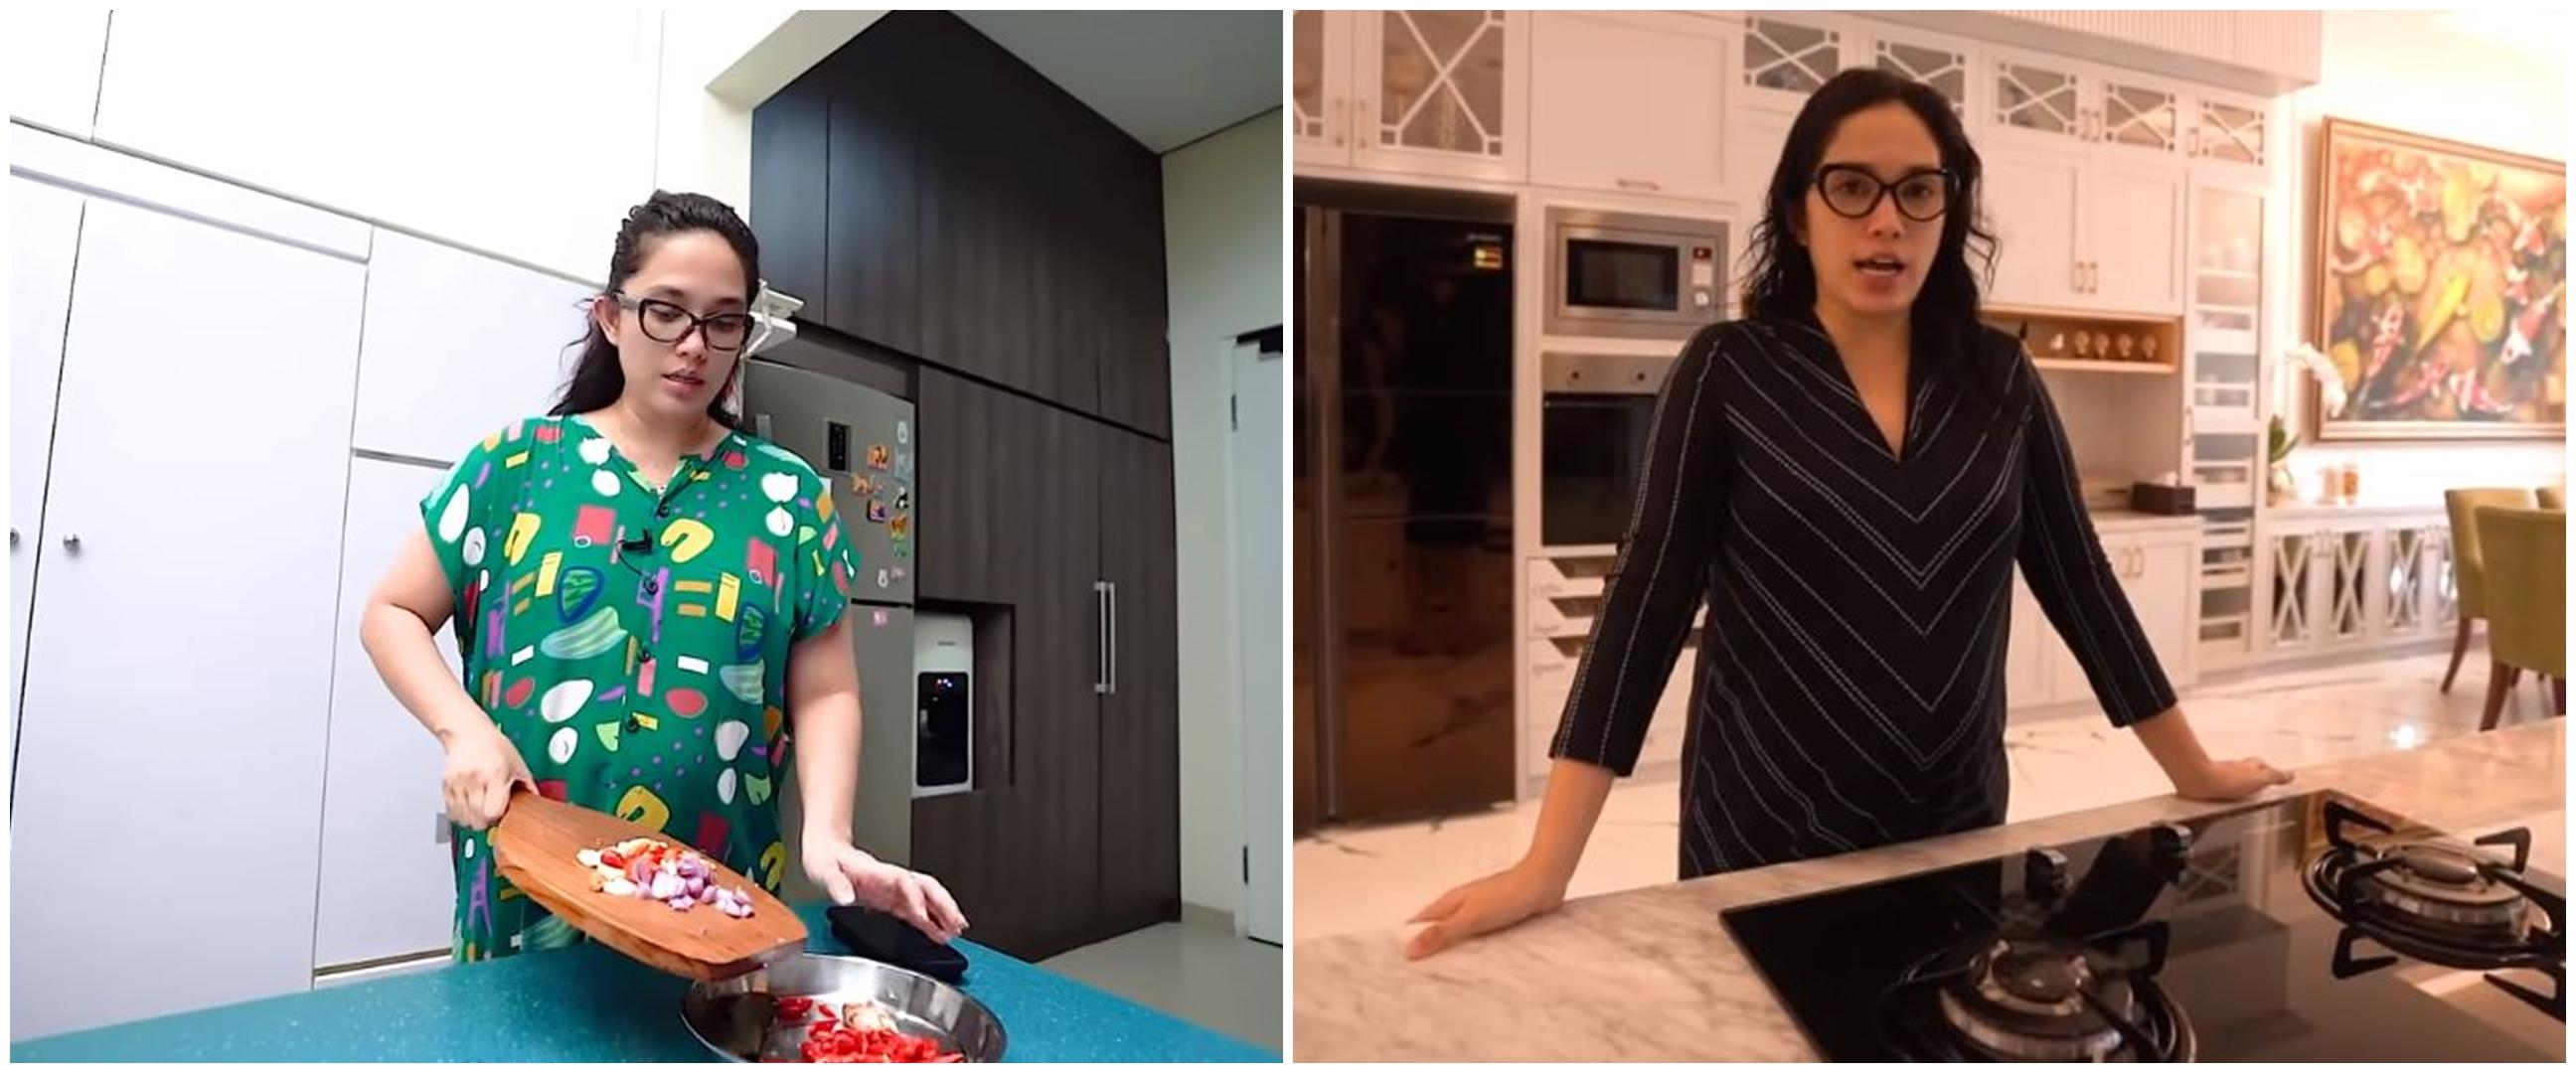 Hobi masak, intip 10 potret 3 dapur rumah Ussy Sulistiawaty